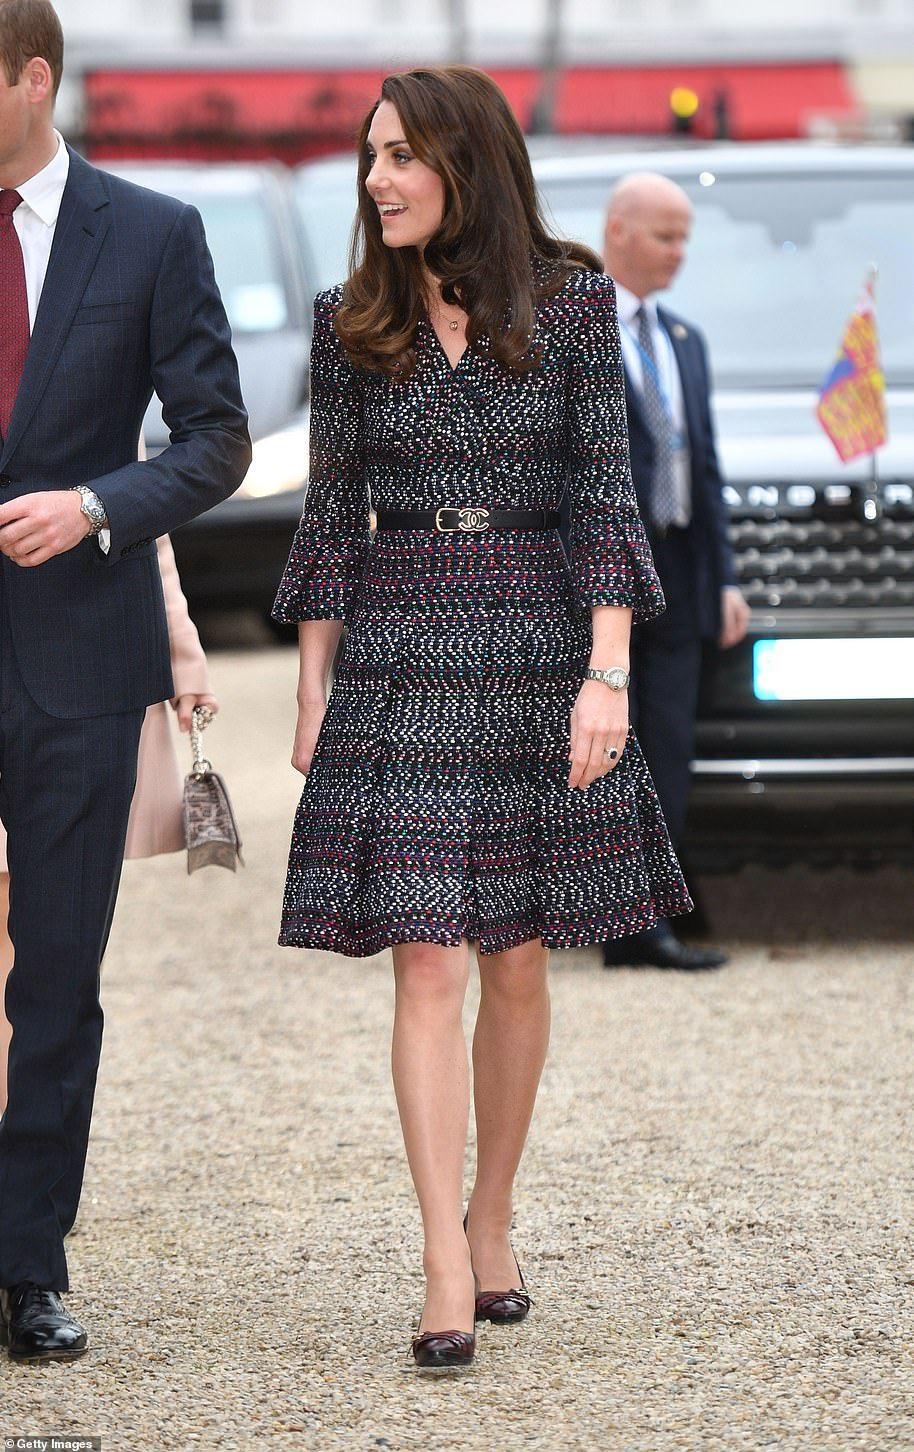 Karl Lagerfeld Dies Aged 85 In France Kate Middleton Photos Duchess Of Cambridge Kate Middleton